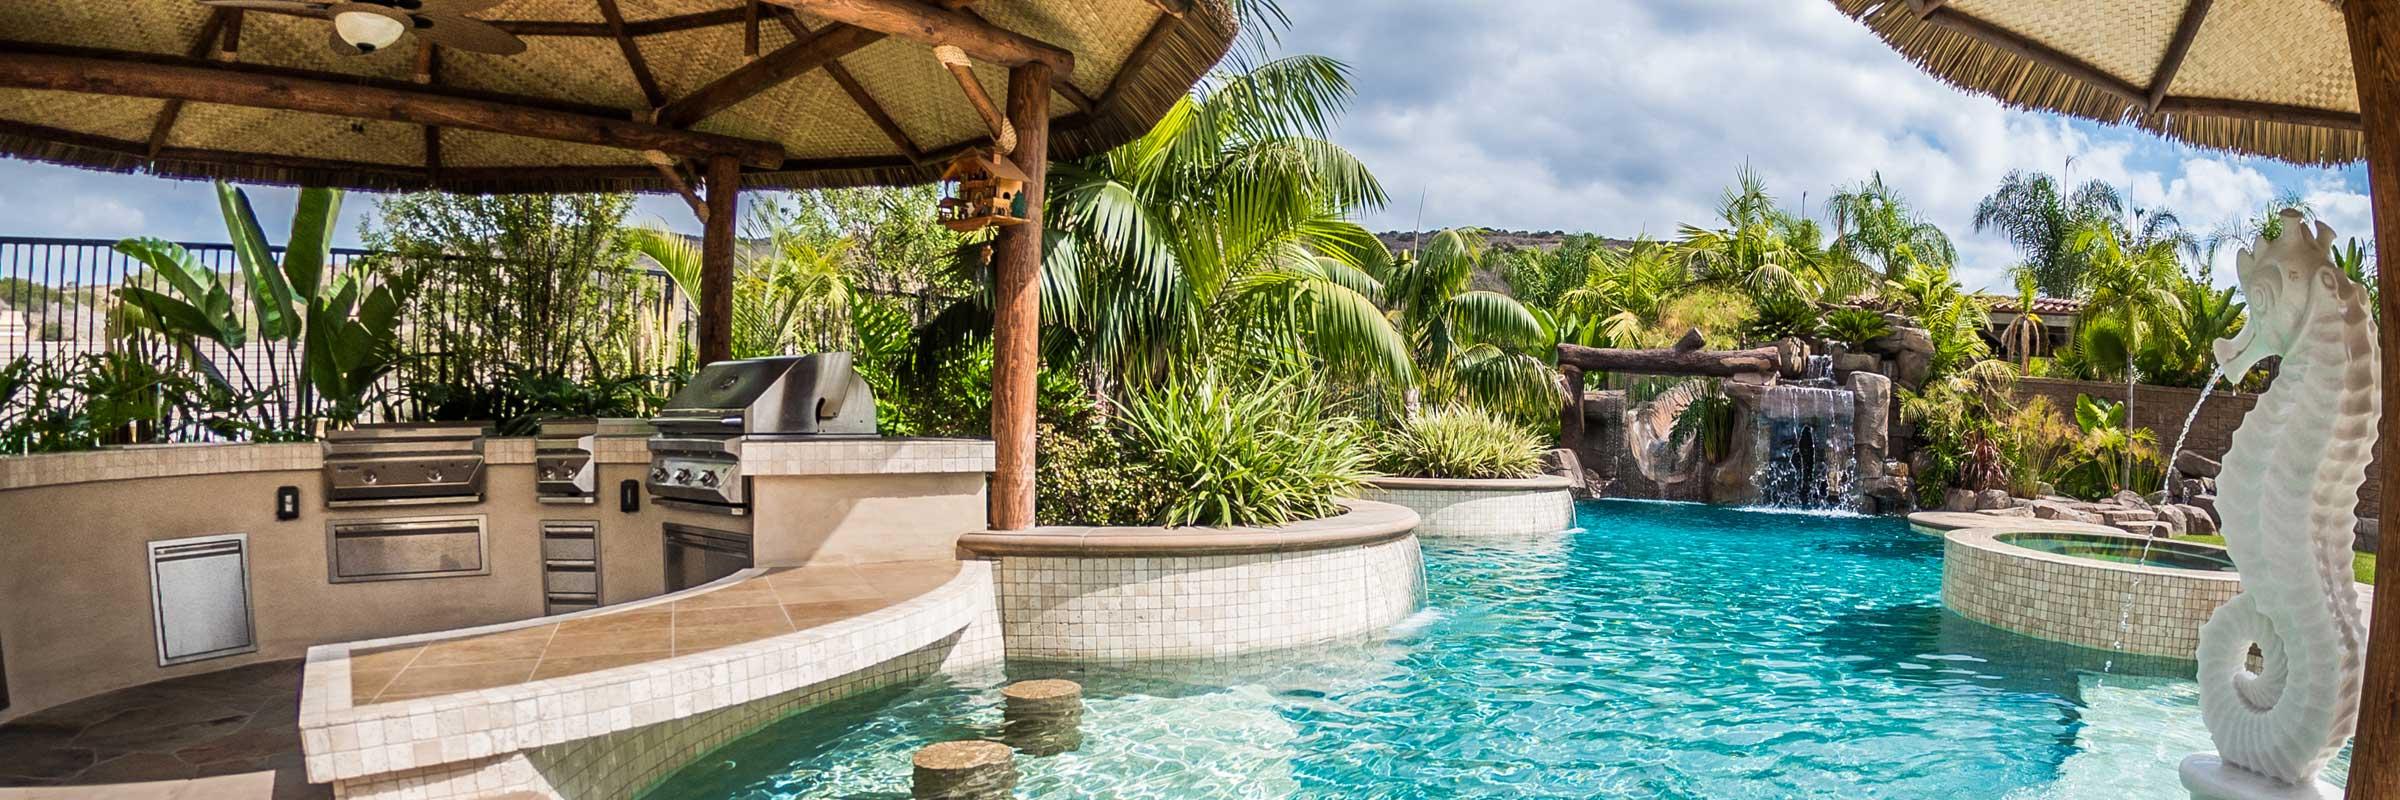 DRC-Pools-1022